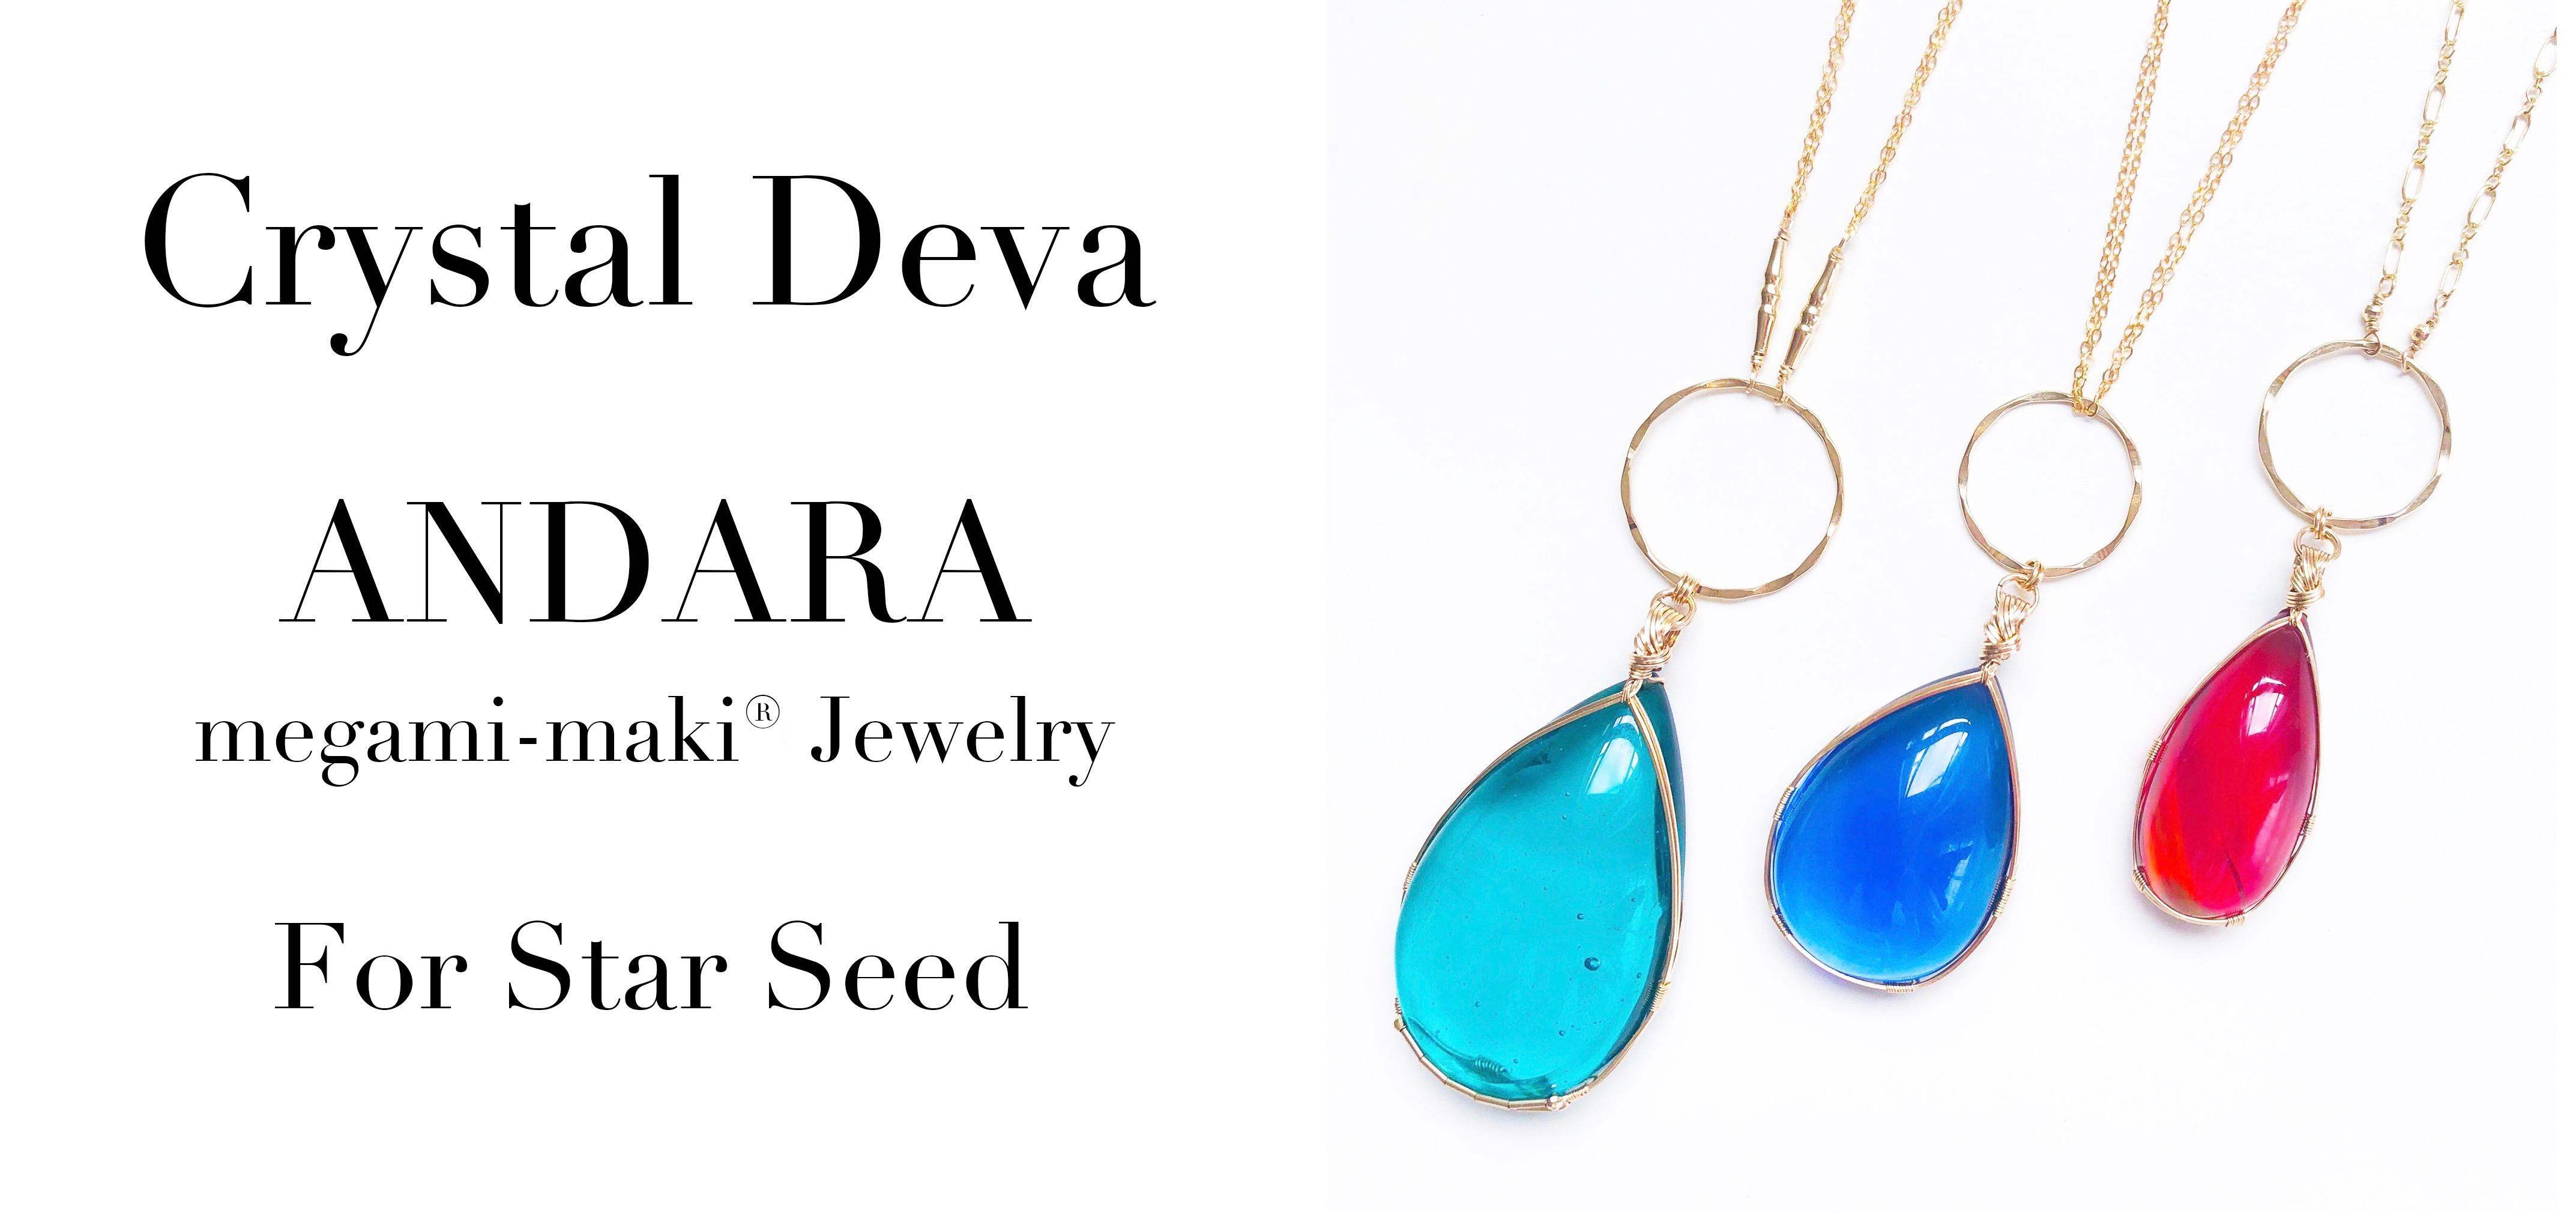 Crystal Deva ANDARA